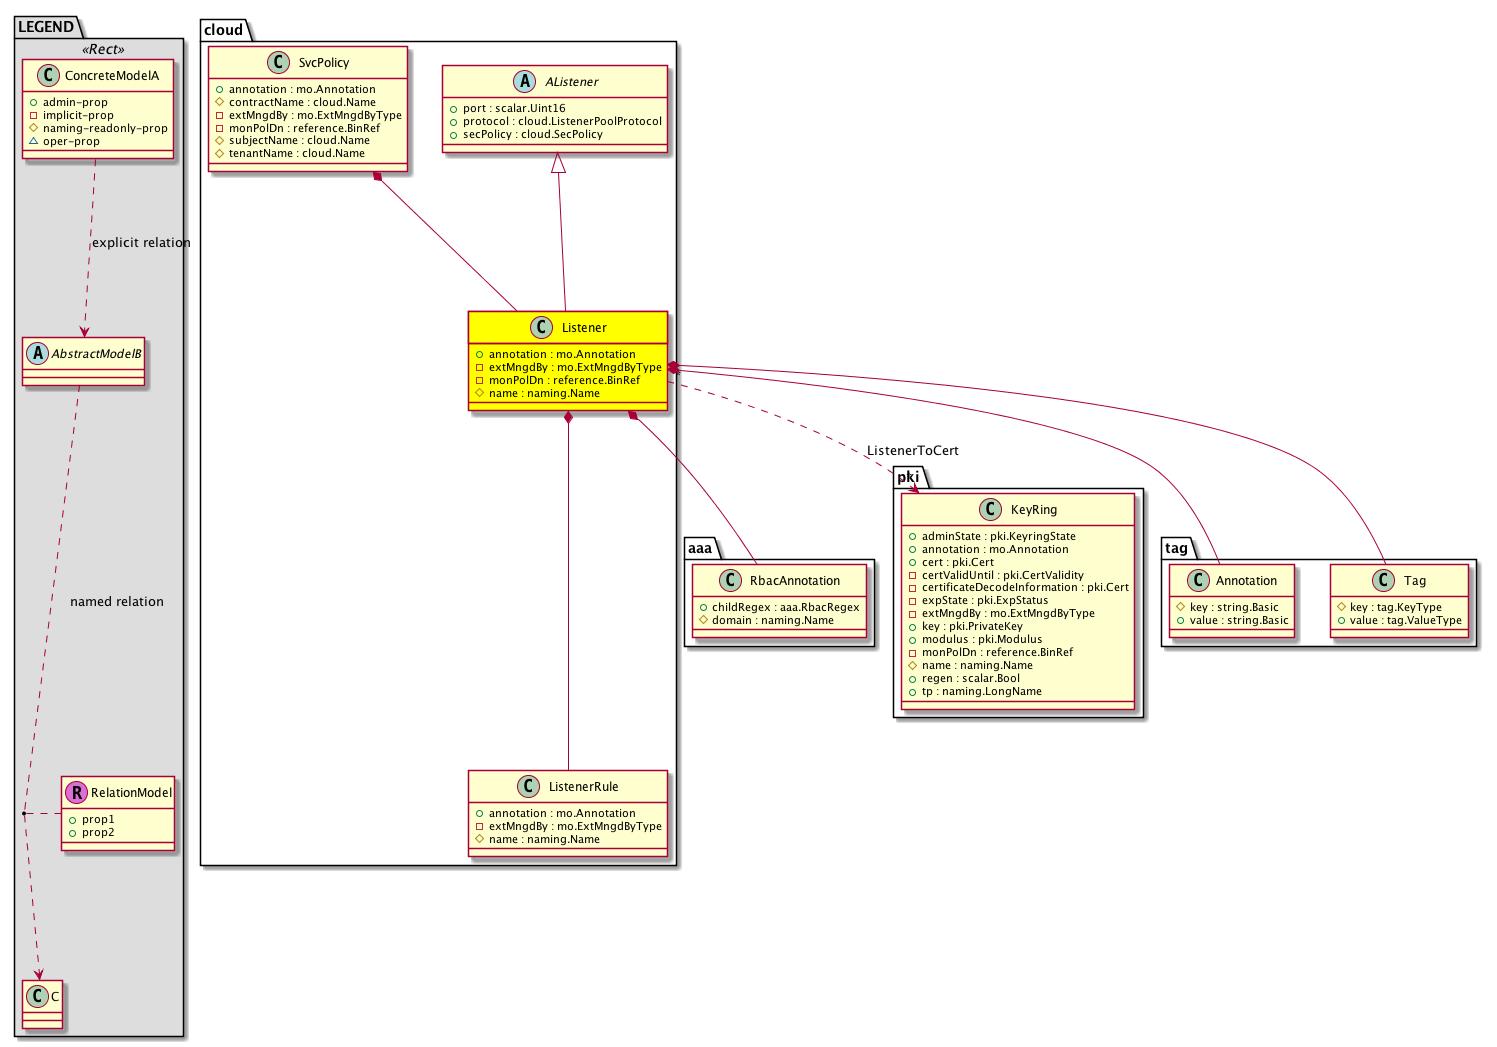 Cisco System Model: Classcloud:Listener